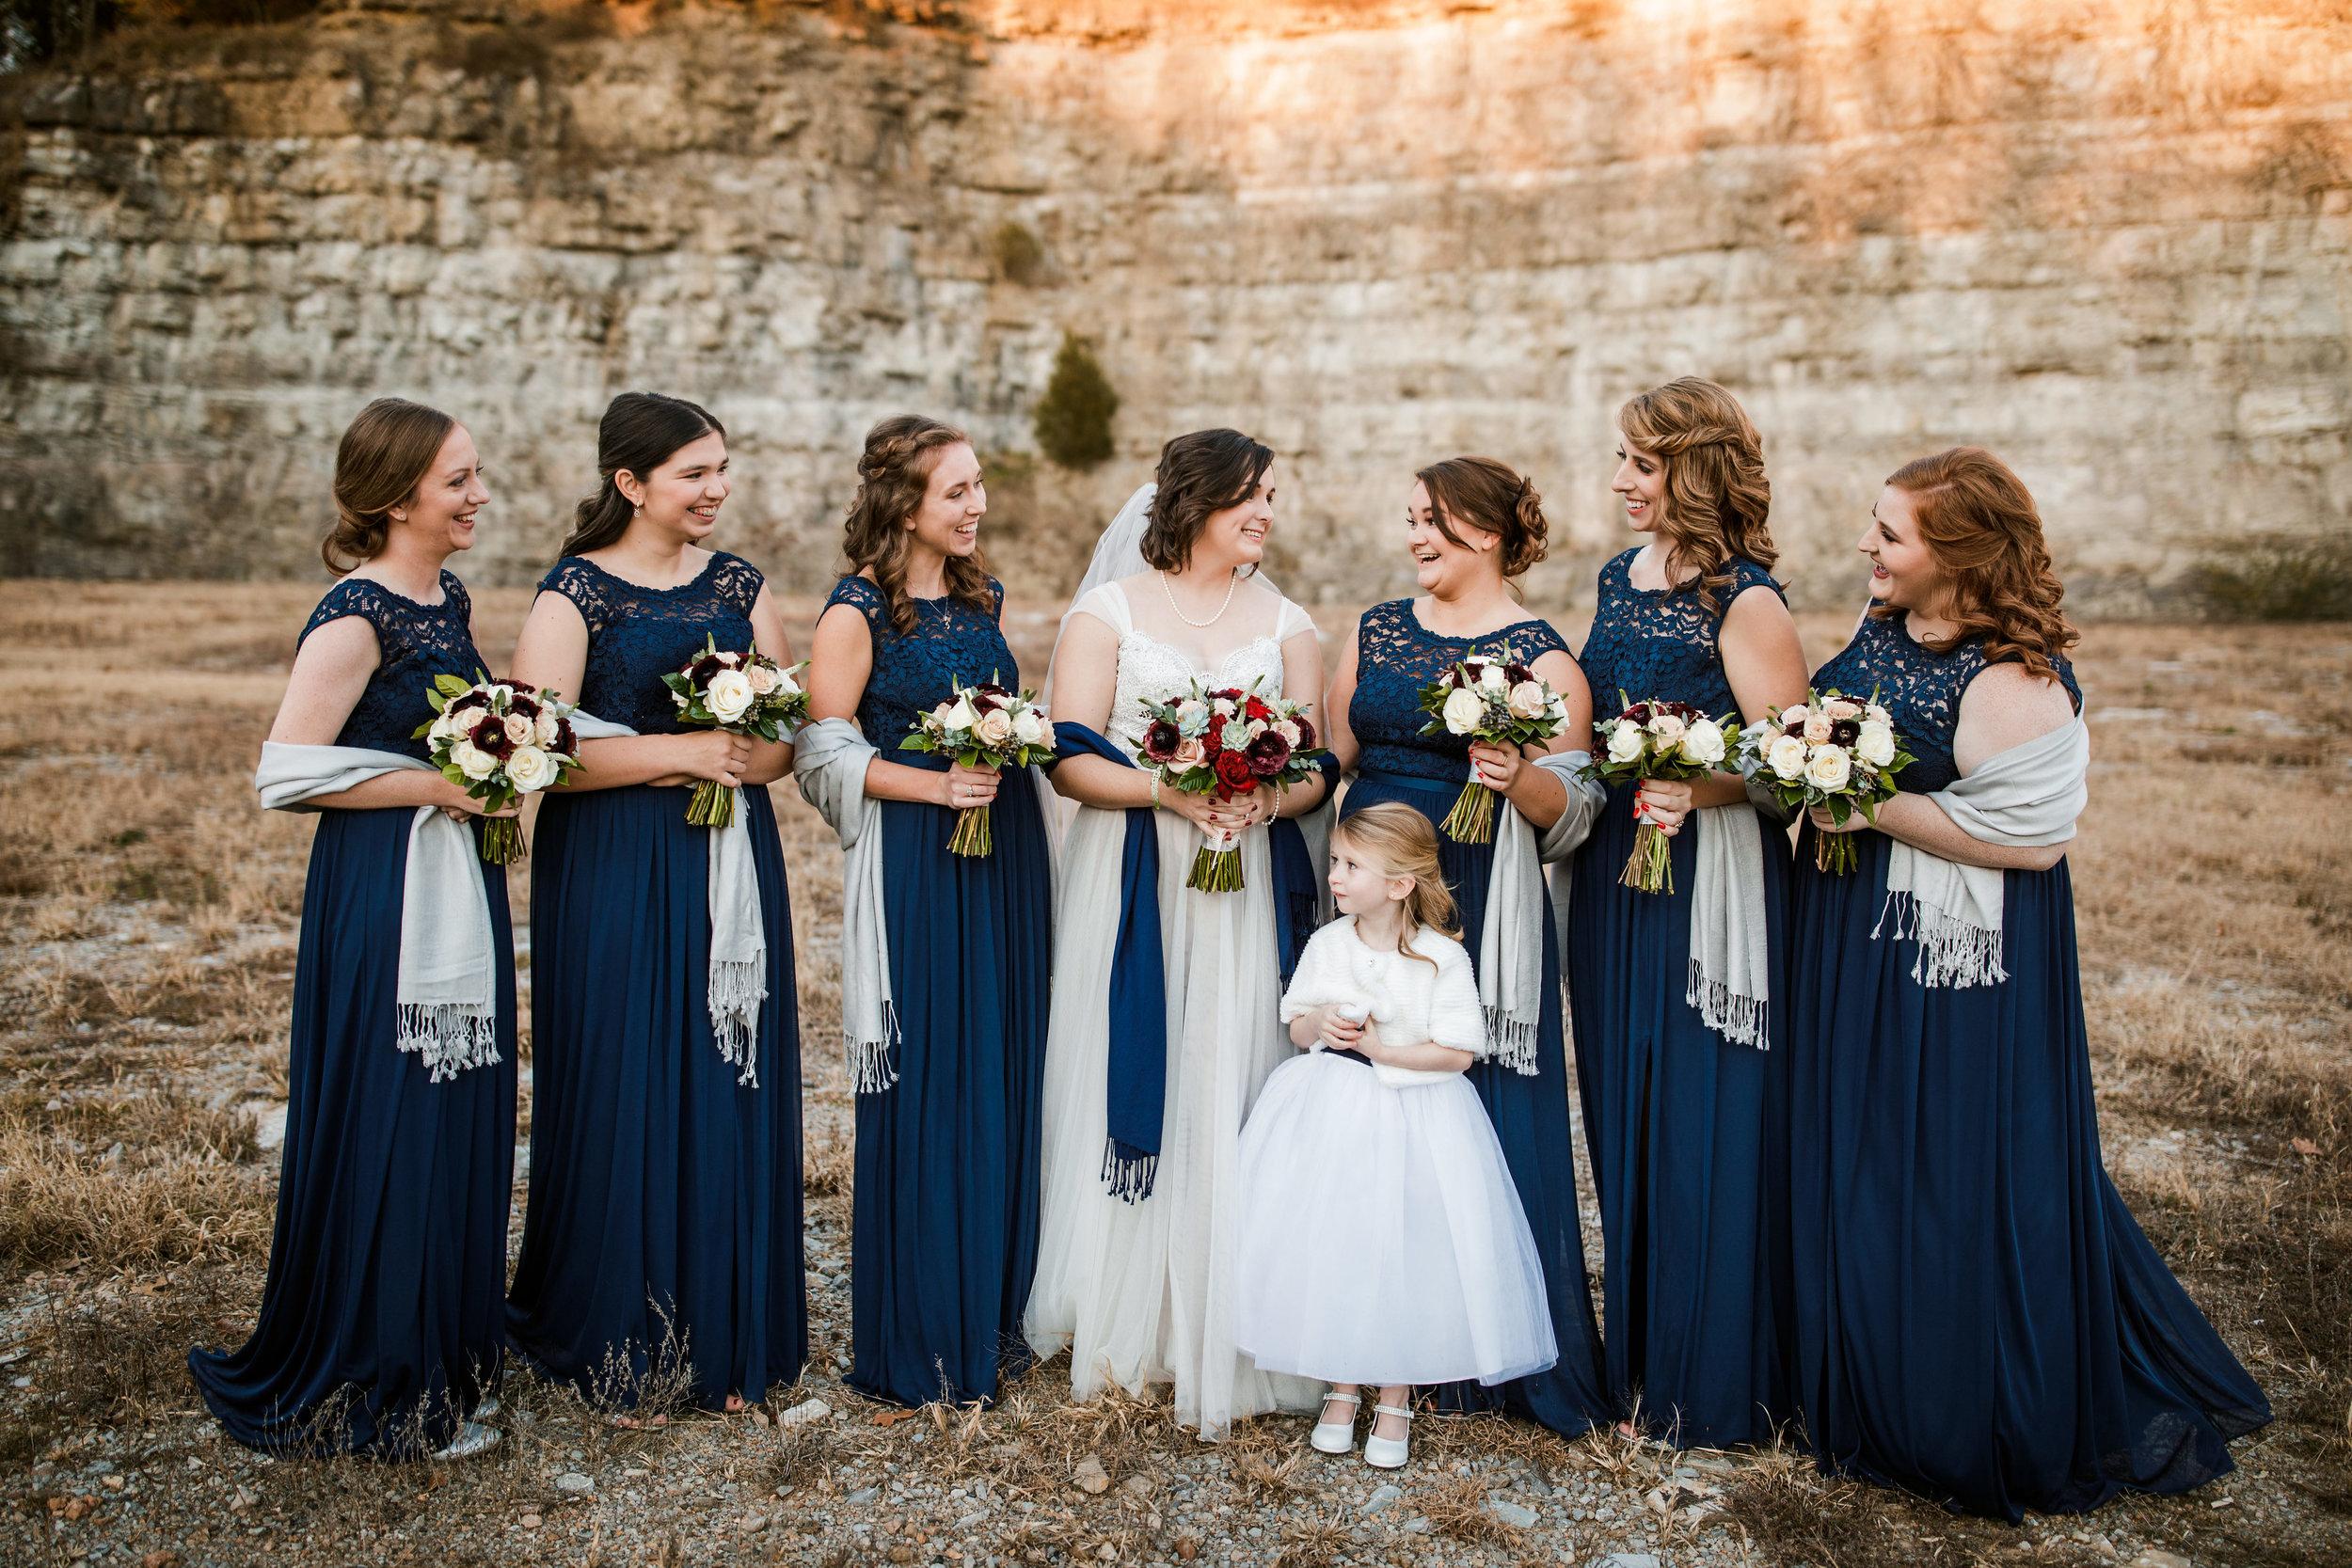 Graystone-Quarry-Wedding 59.jpg